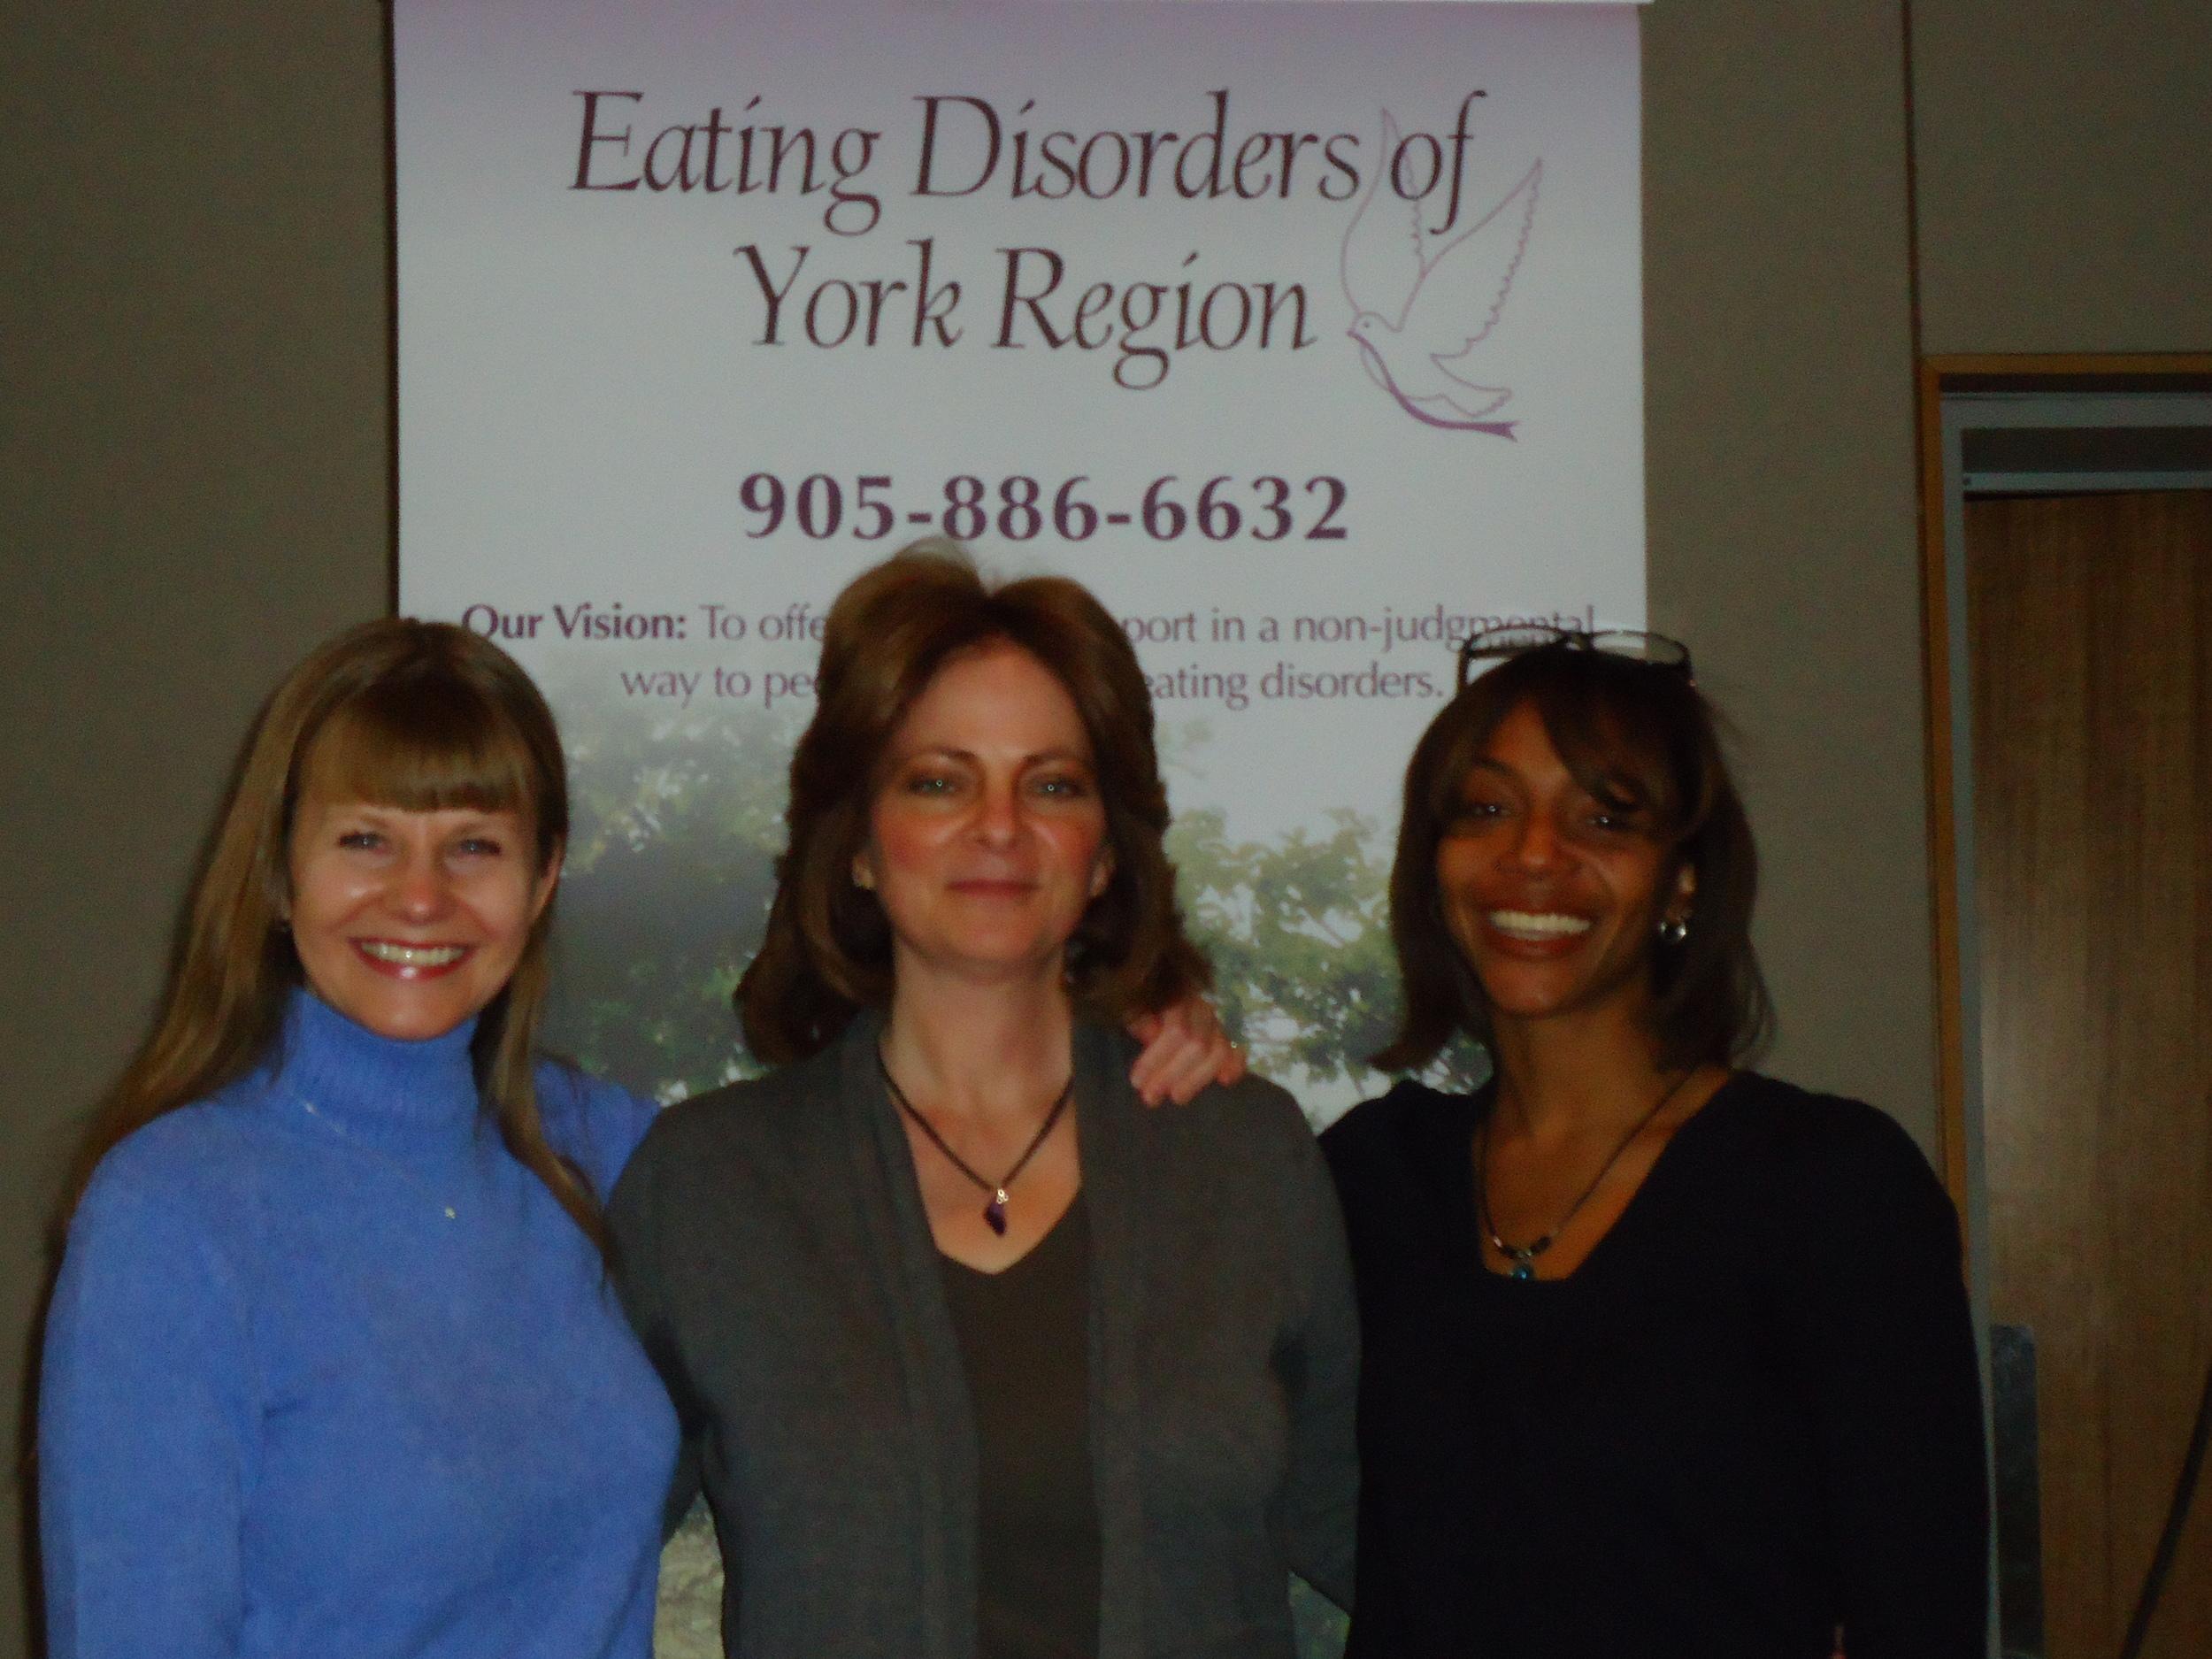 Jane Alway, Janice Morgante, and  Dr. Tiffany-Rush Wilson